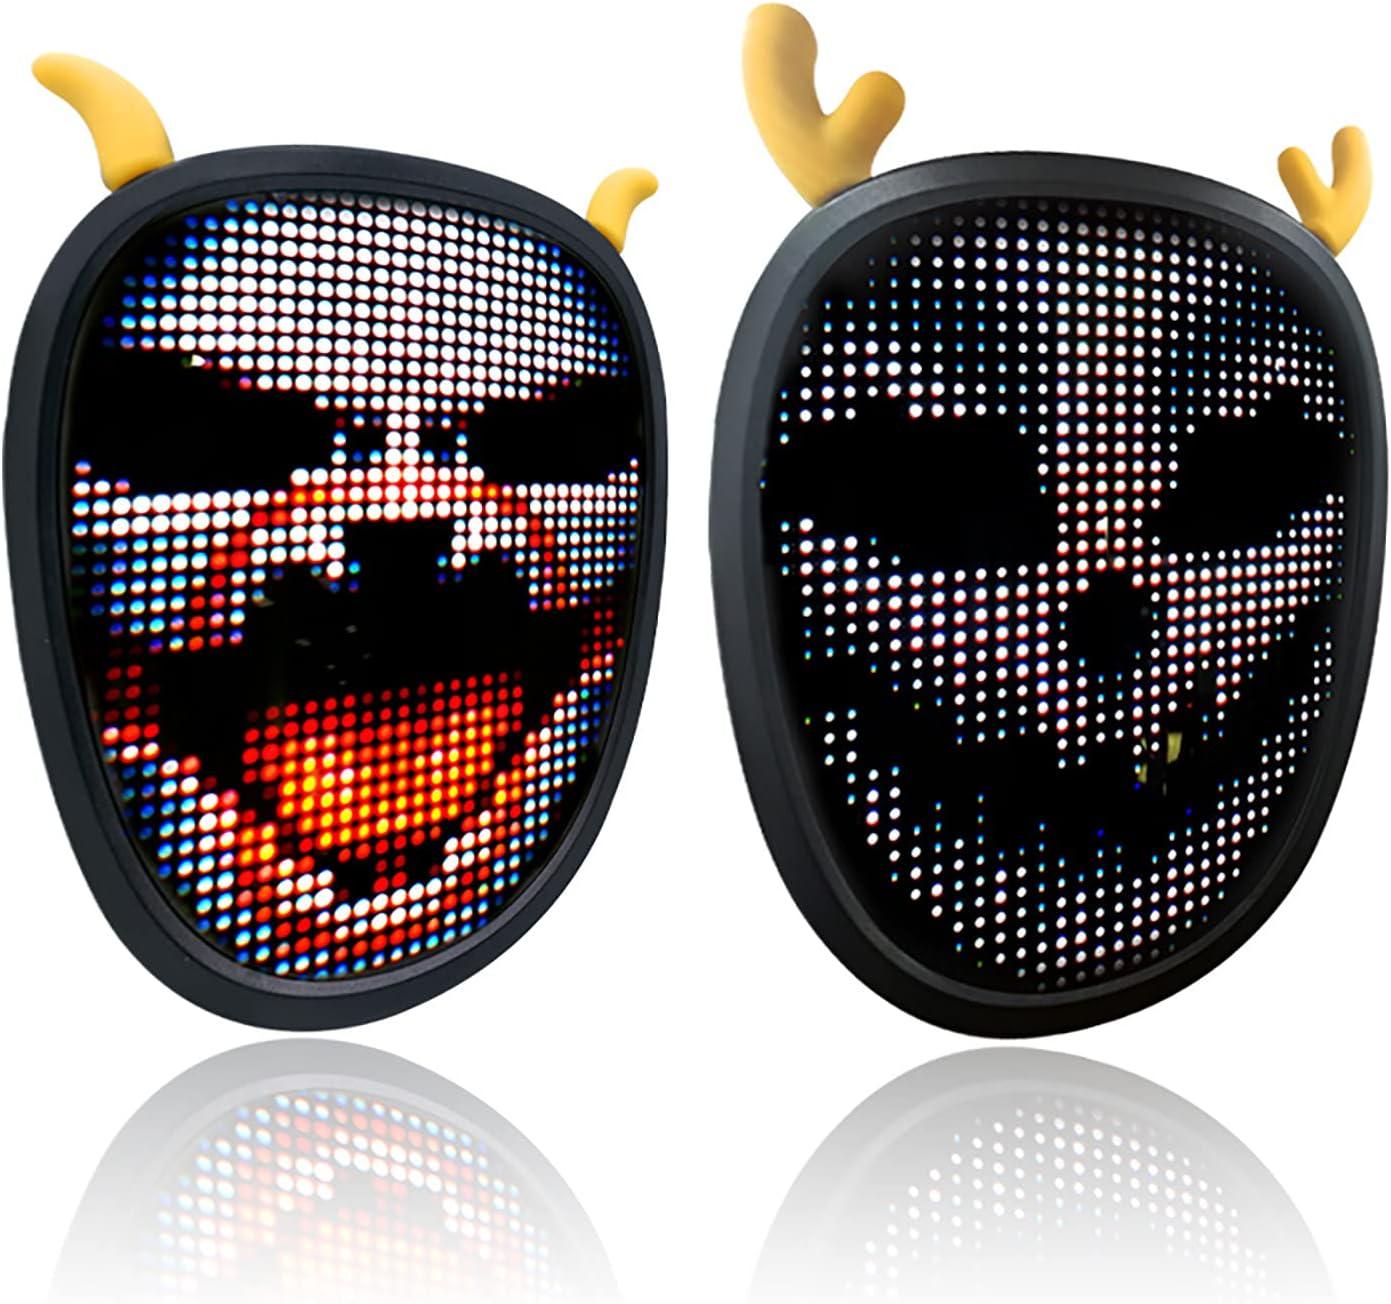 LED Shining Halloween Mask DIY Portland Mall Bluetooth Programmable Ligh Mini Factory outlet